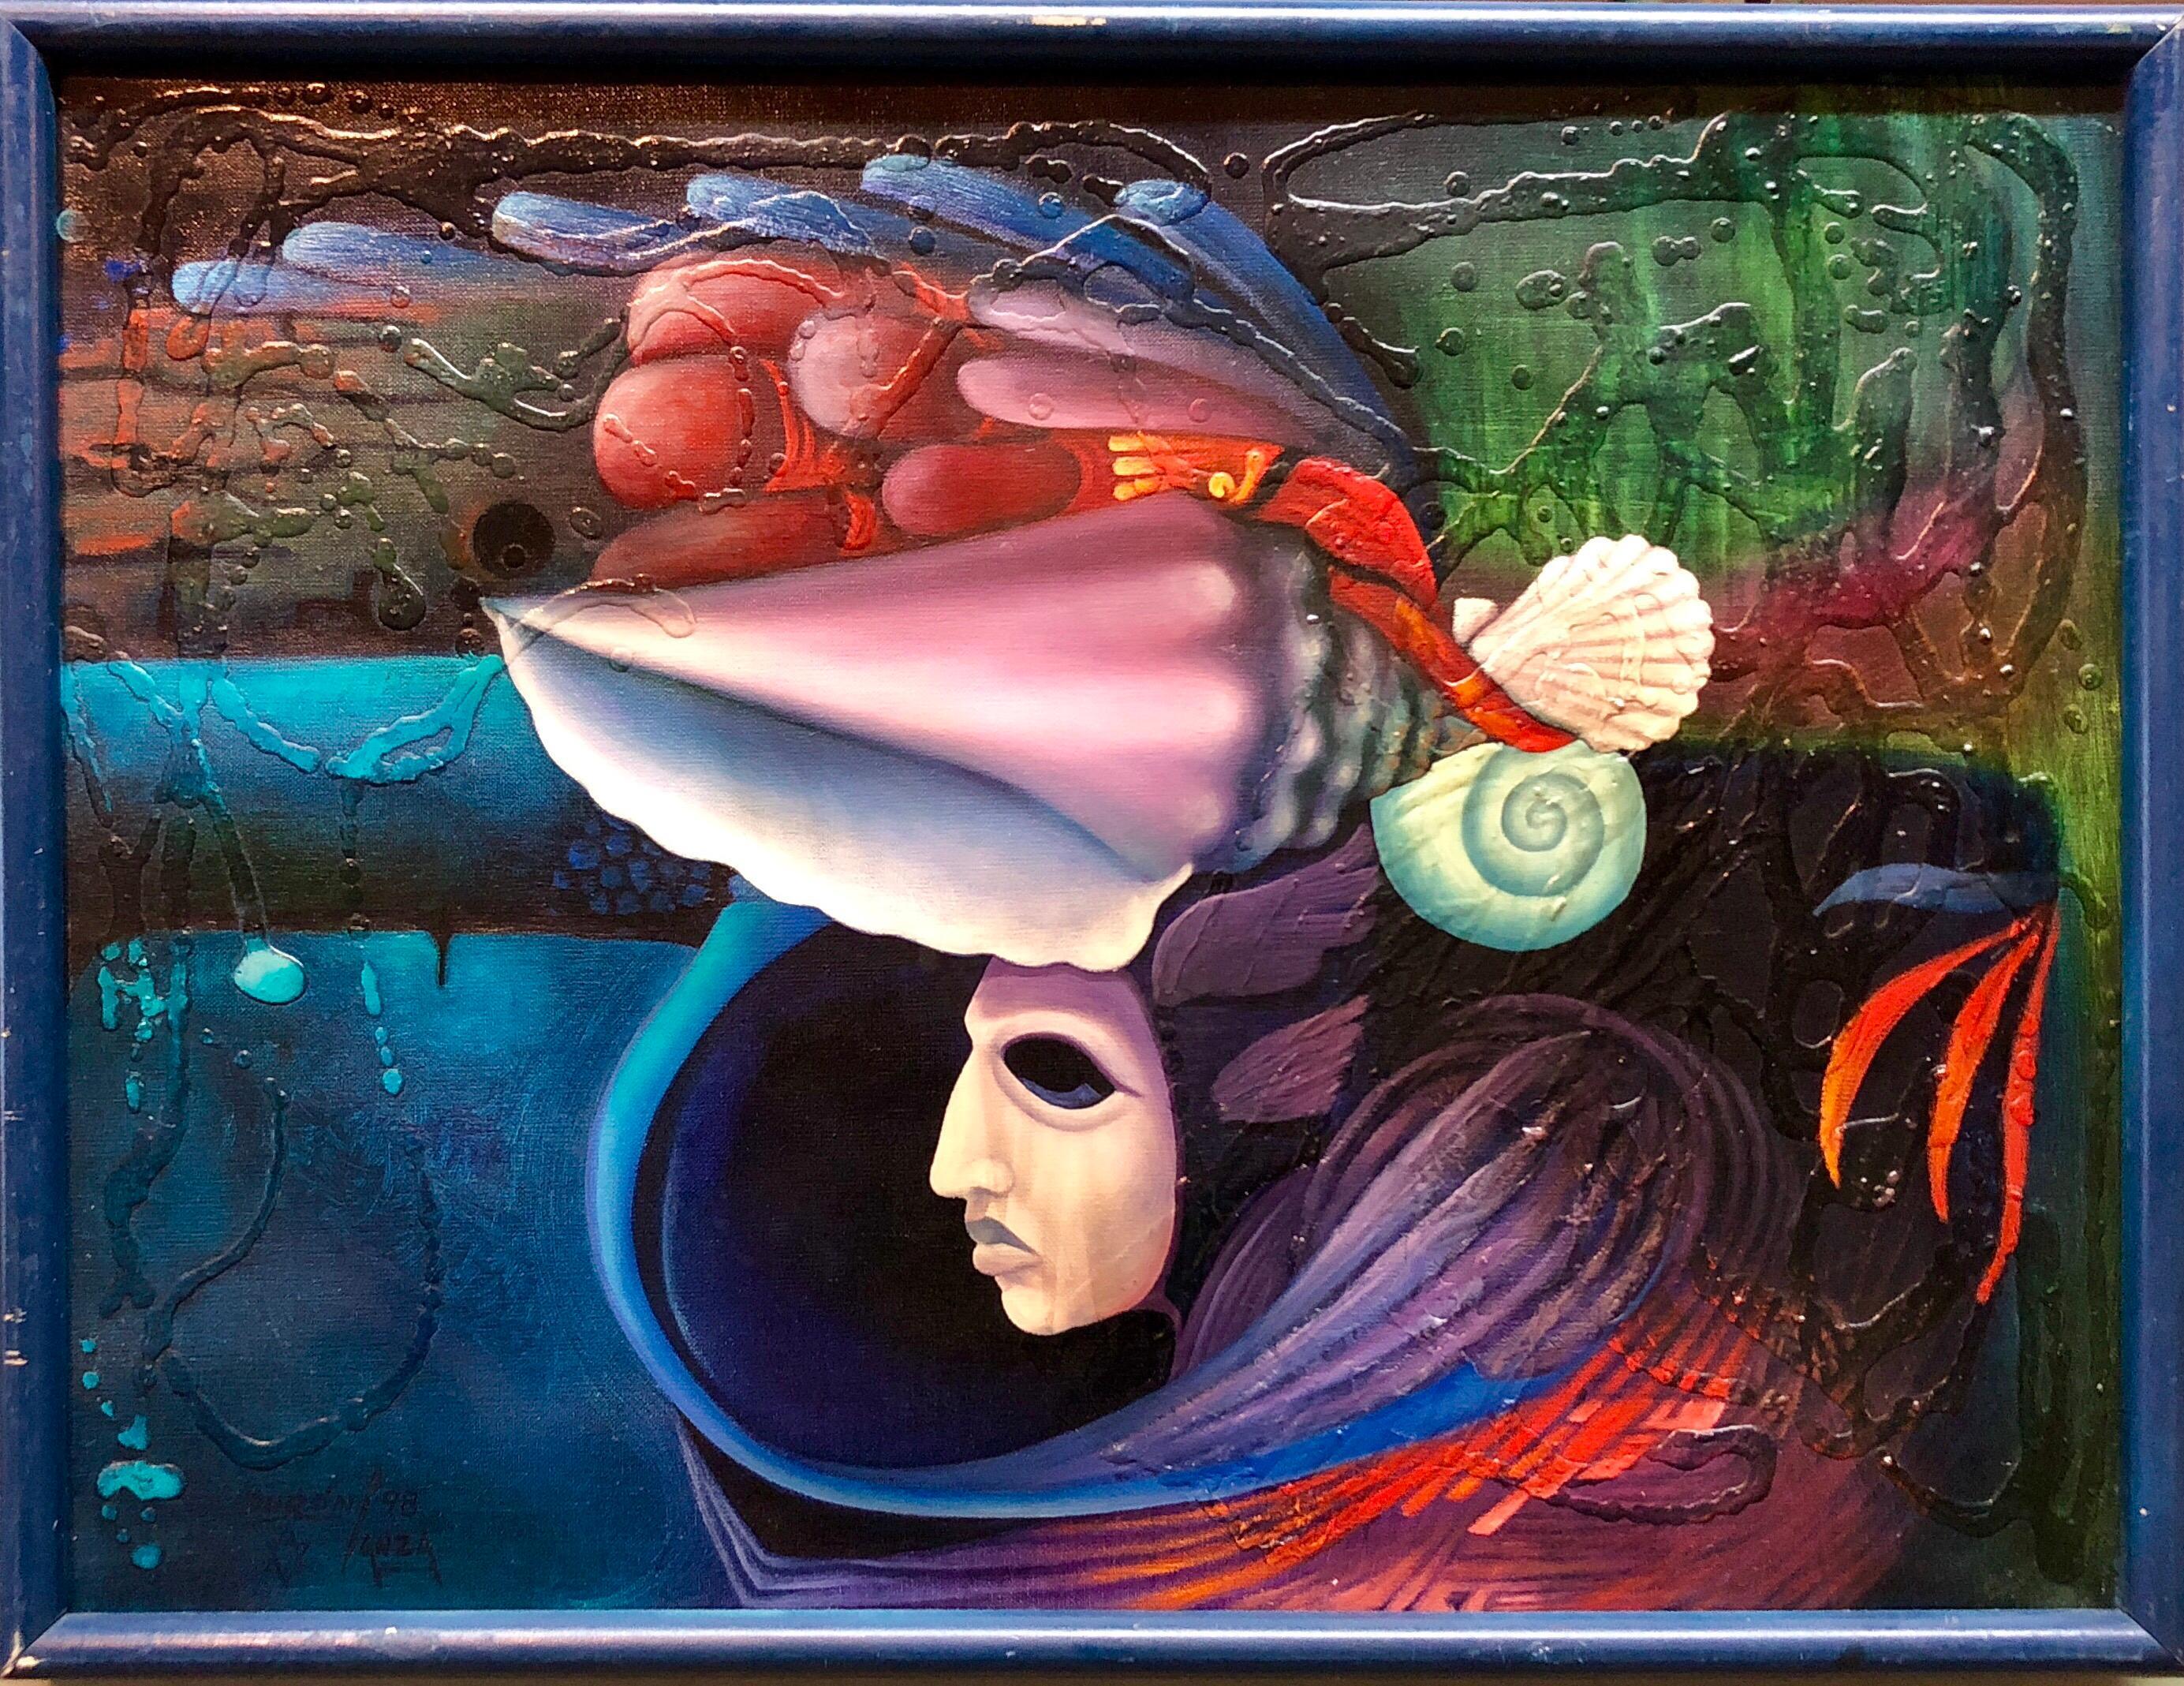 Magic Realist Surrealist Latin American Naive Fantasy Painting